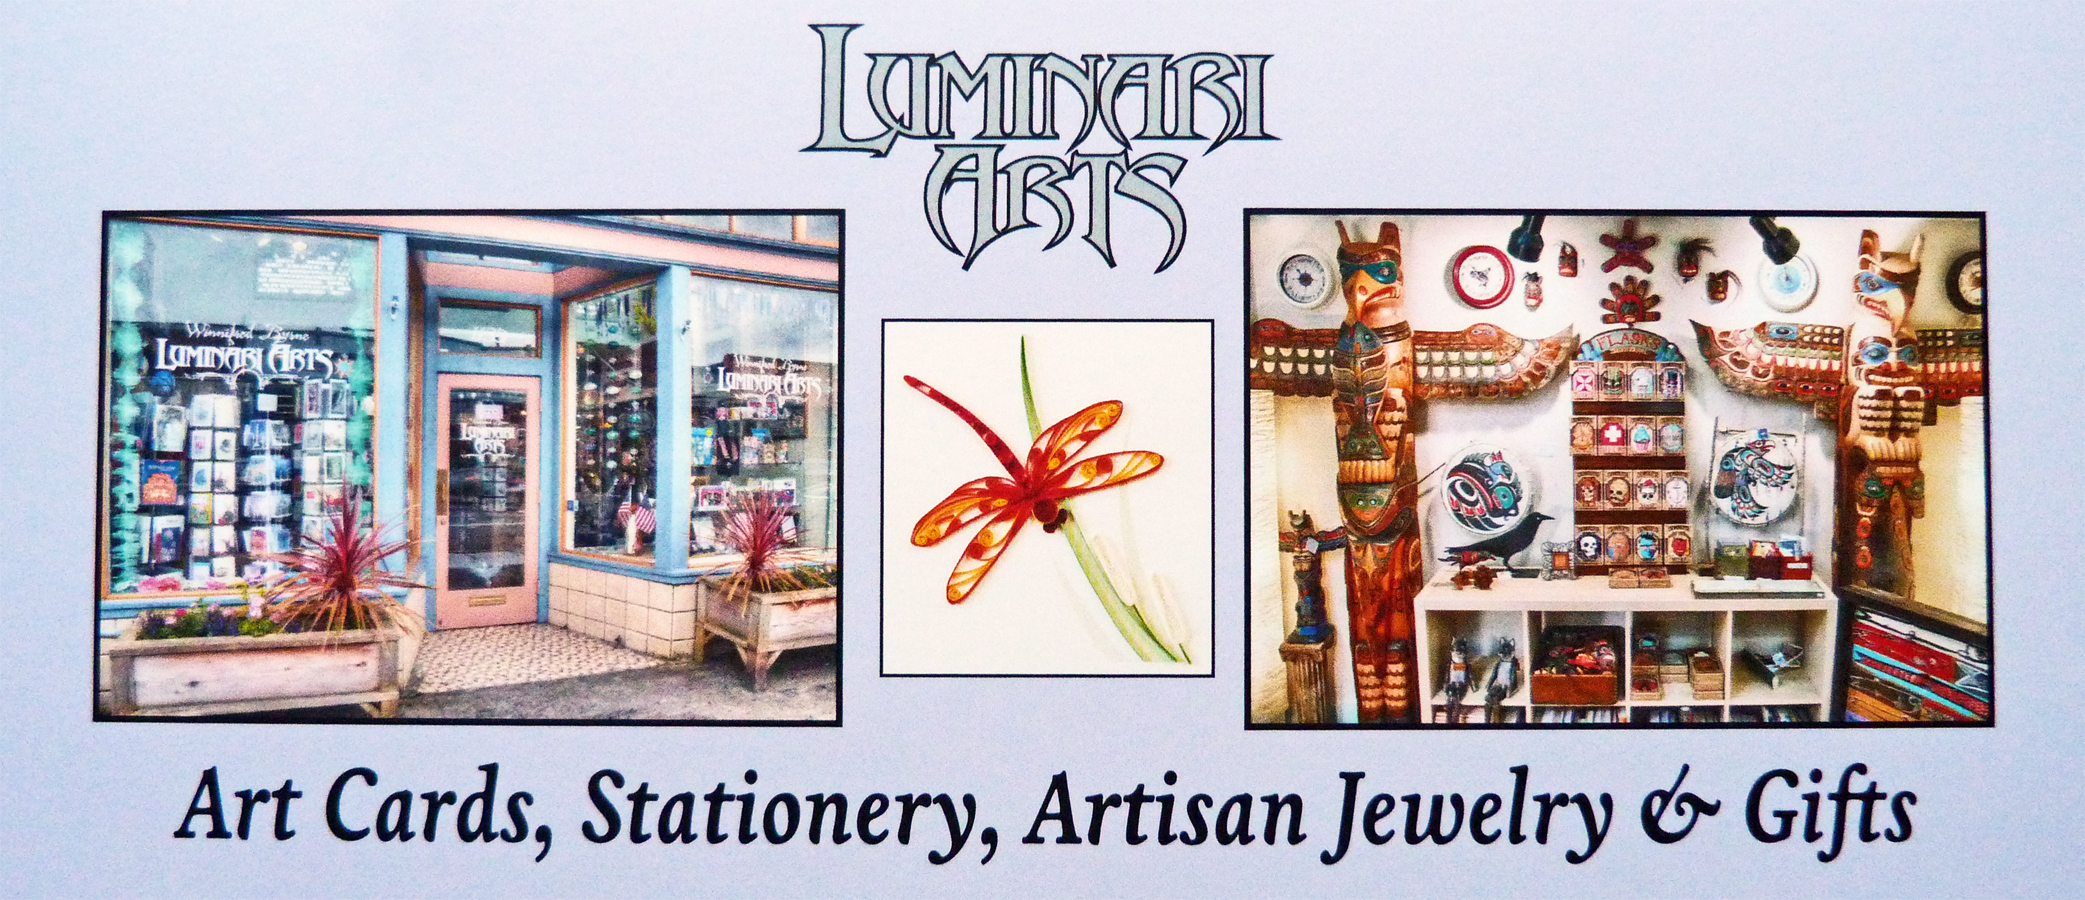 luminari-arts-retail-store-astoria-oregon